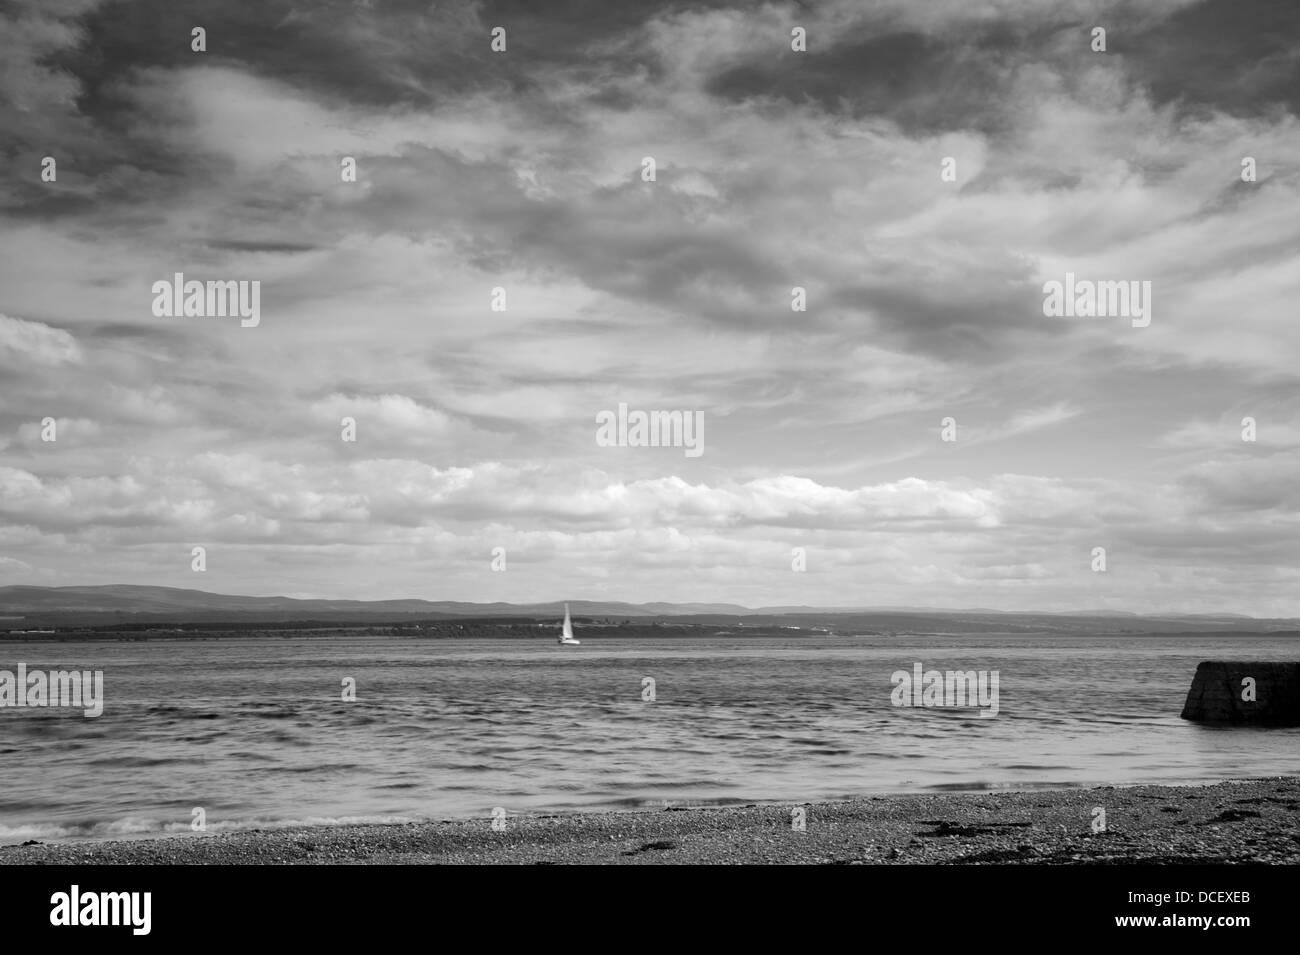 Sail boat under big sky - Stock Image